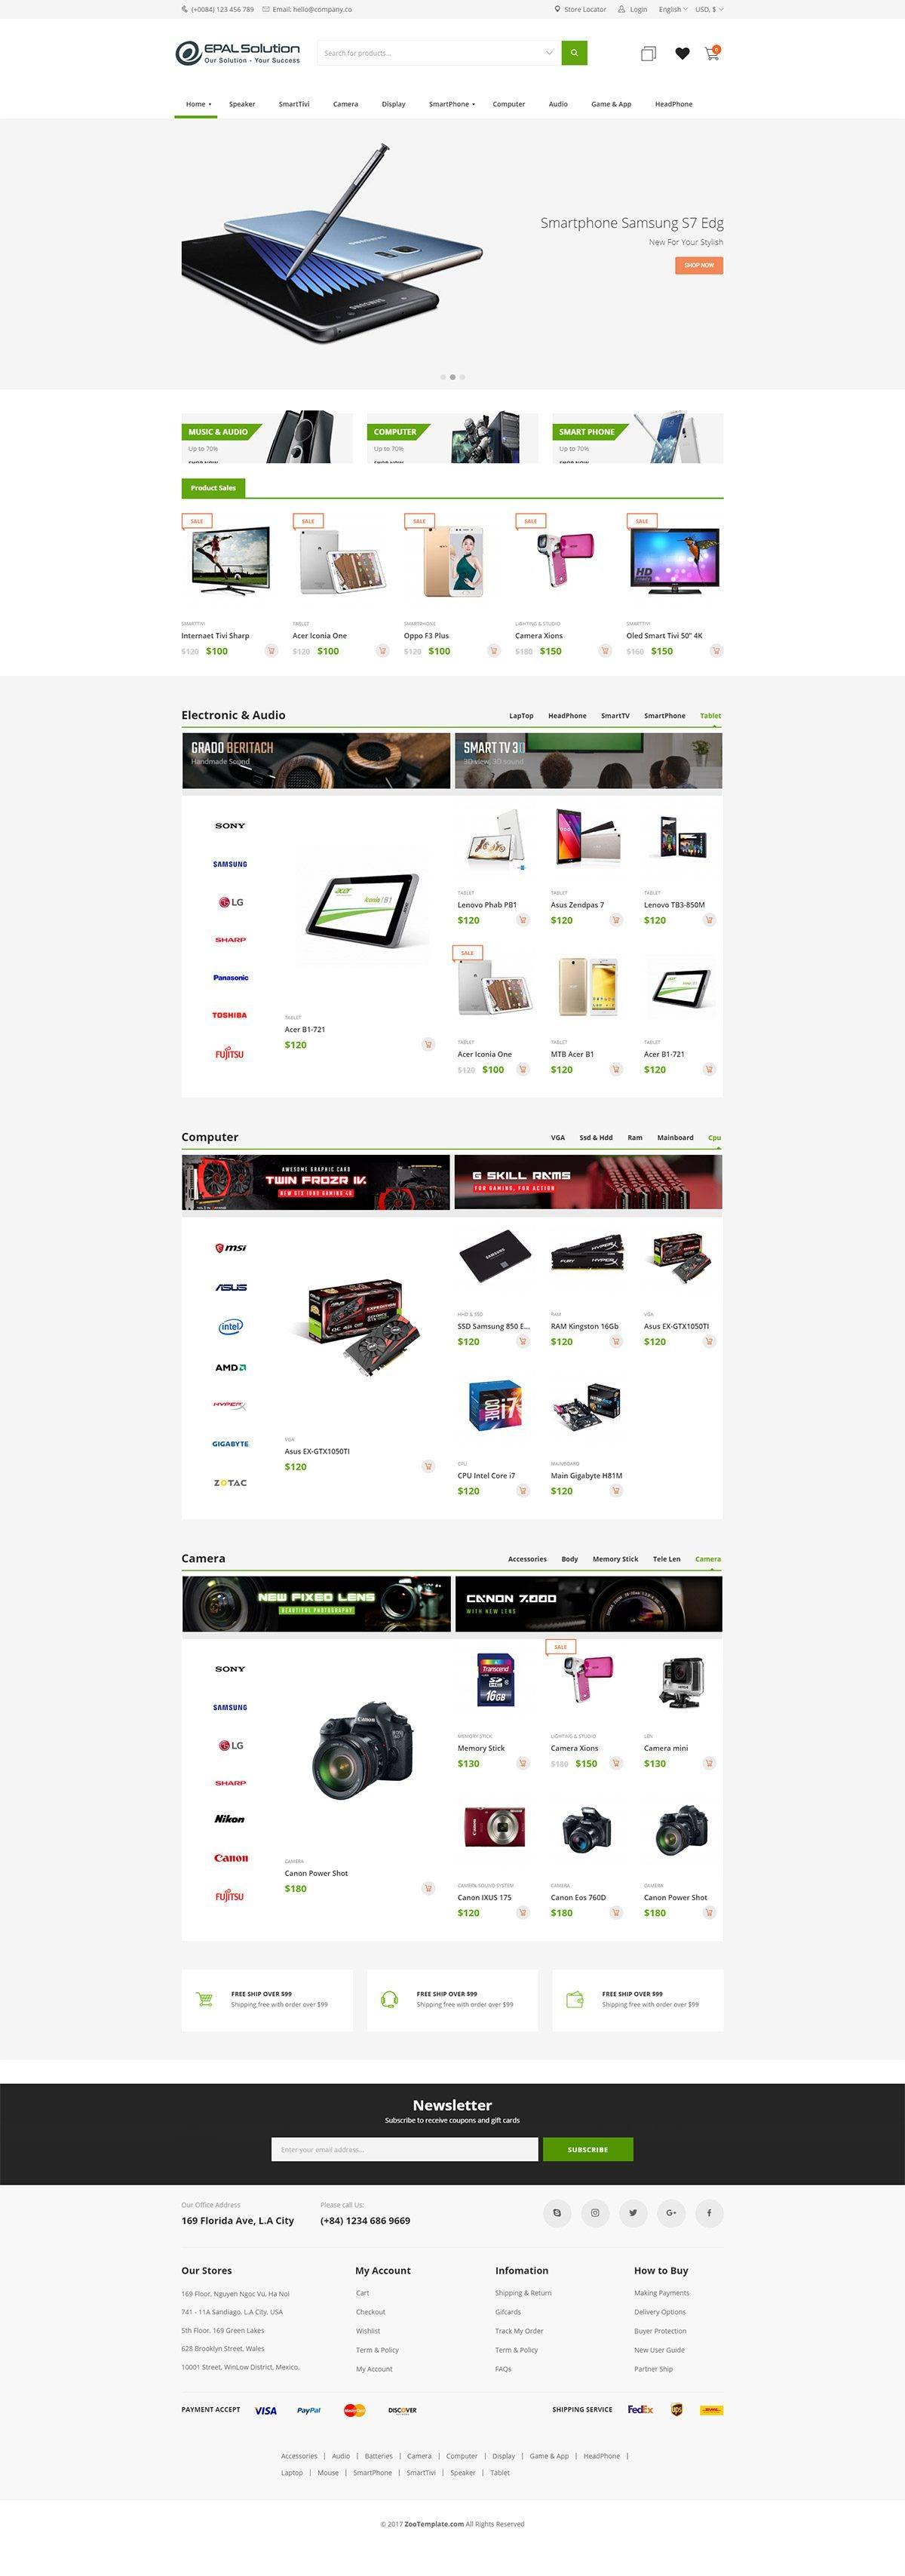 Giao-dien-website-thuong-mai-dien-tu-MediaMart